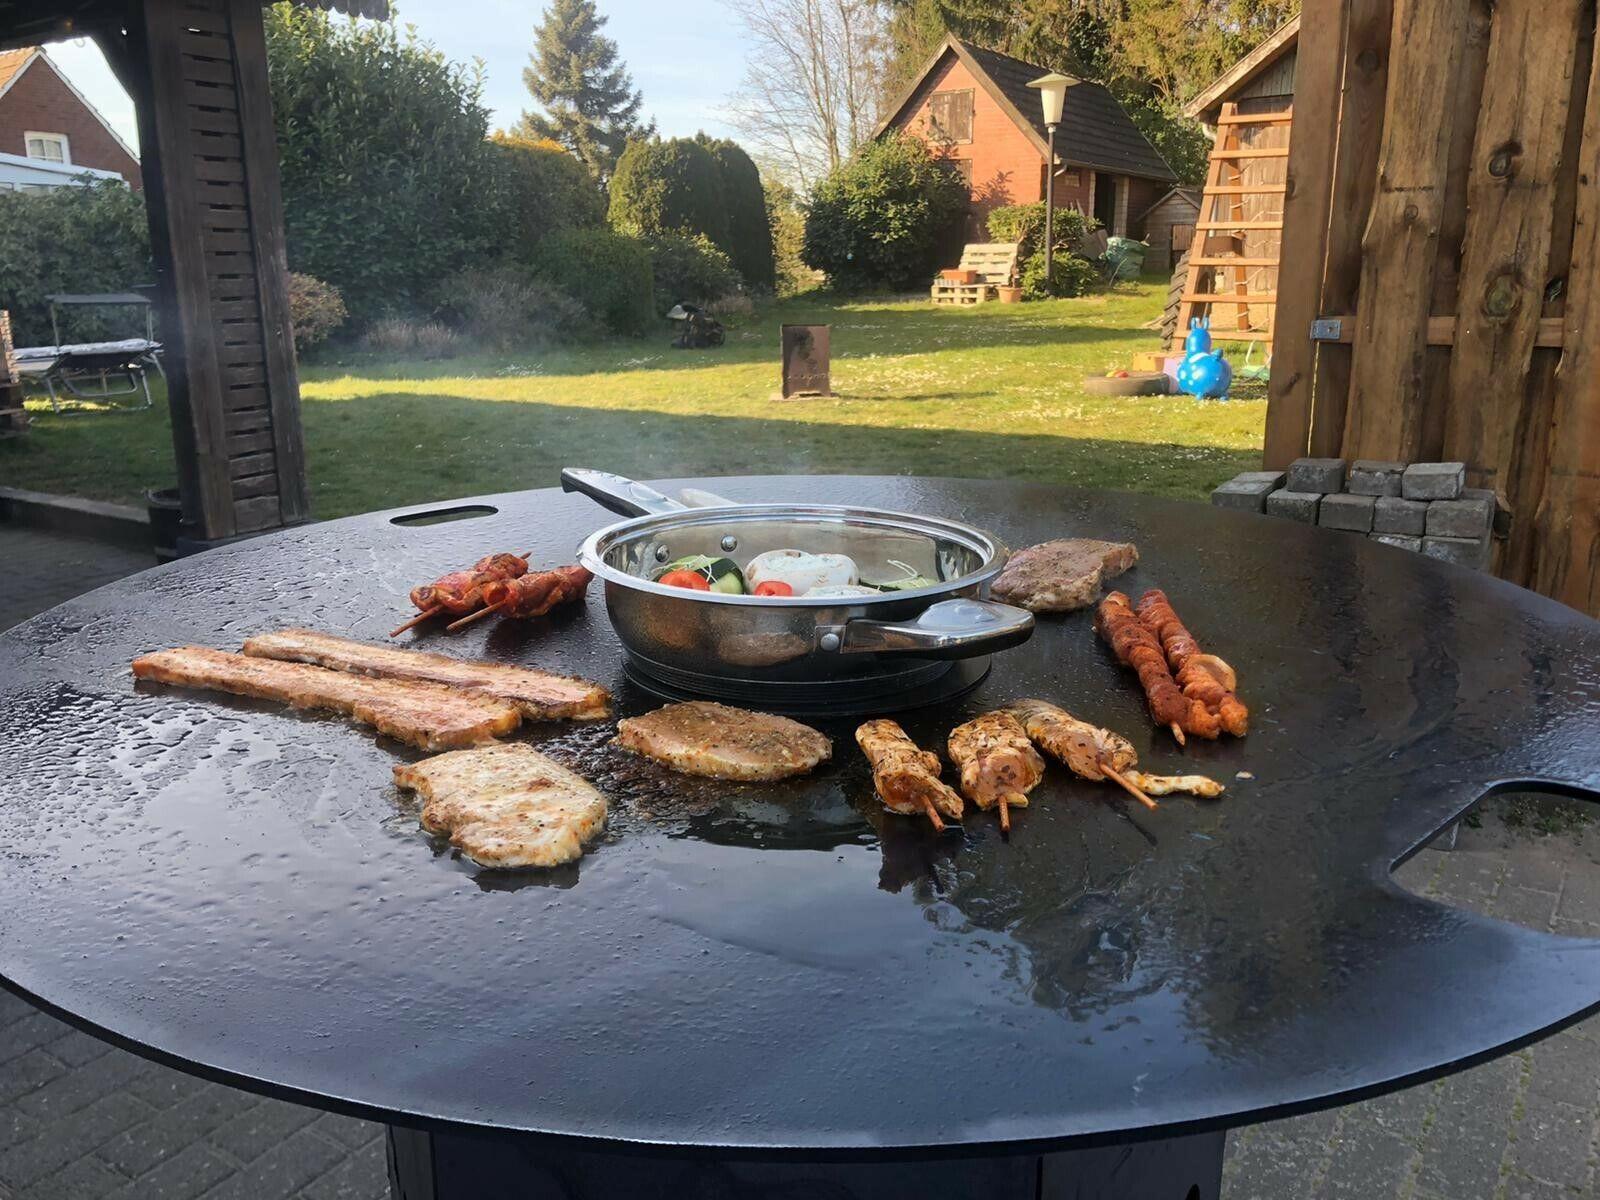 Feuerplatte Plancha Grillplatte 5  6  8 mm  80  90  100 cm Grill GN-Behälter 1/9